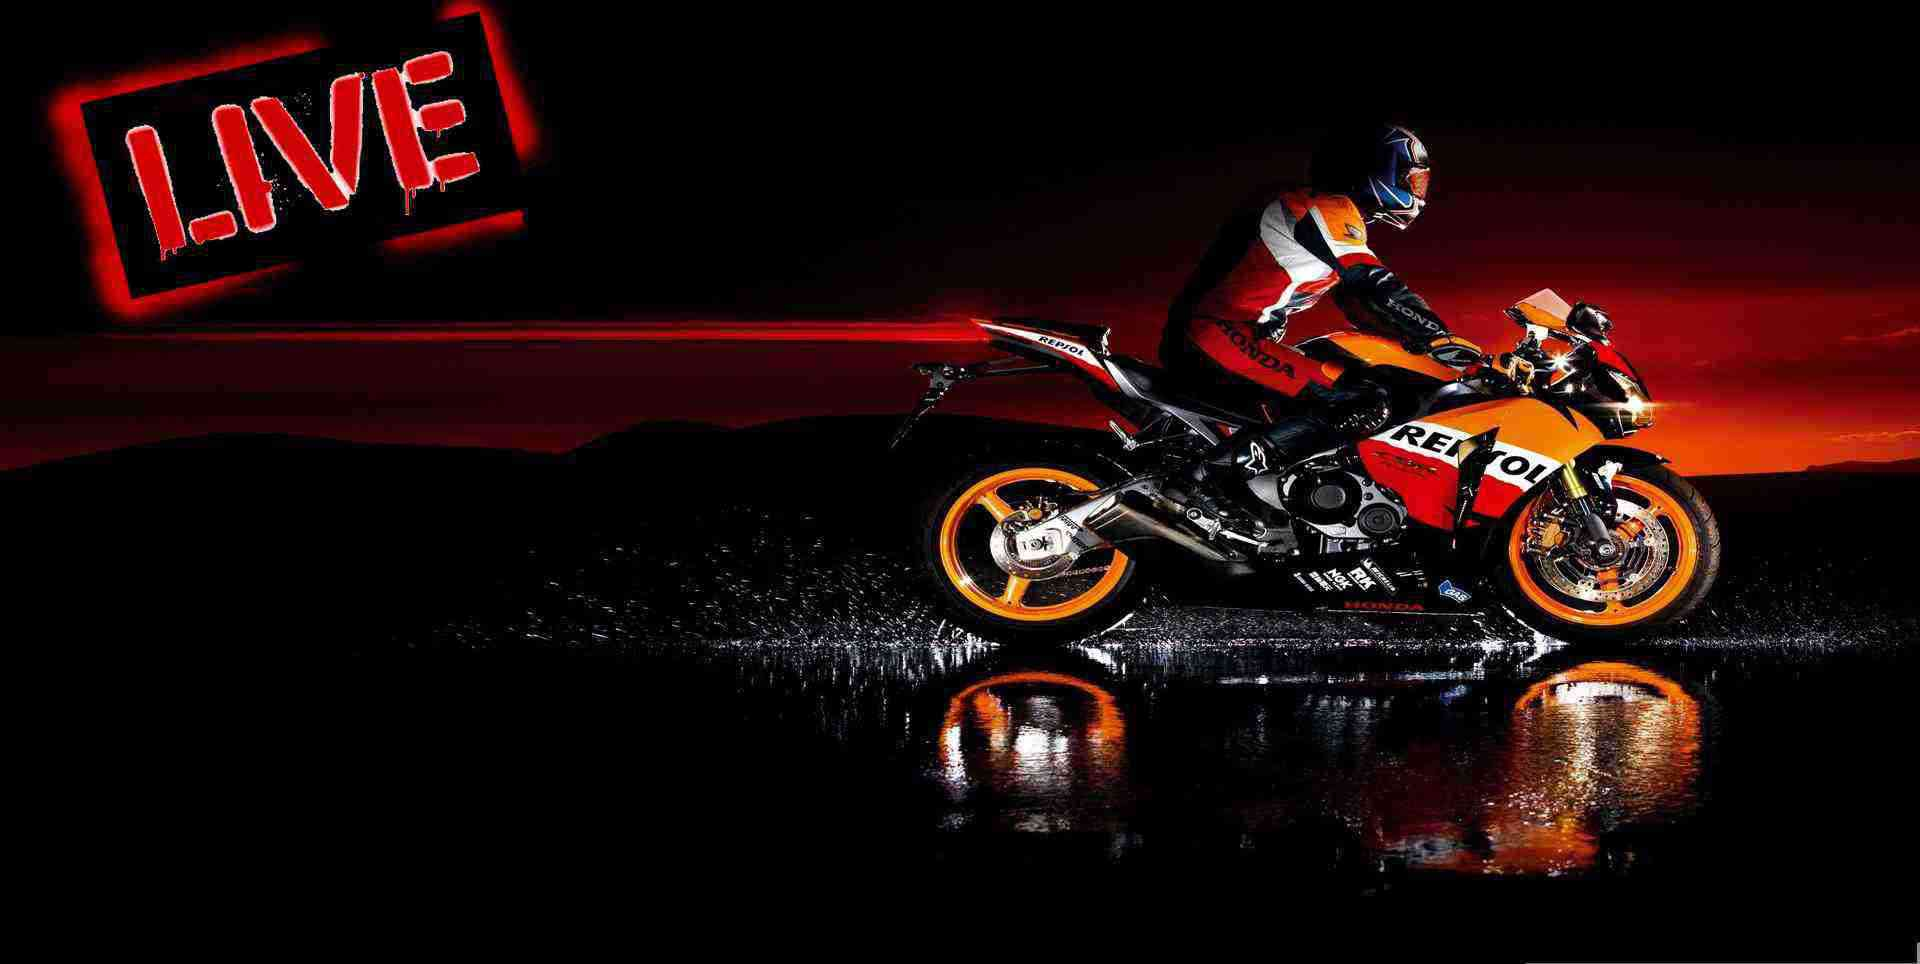 Live 2014 Italian motorcycle Grand Prix Online